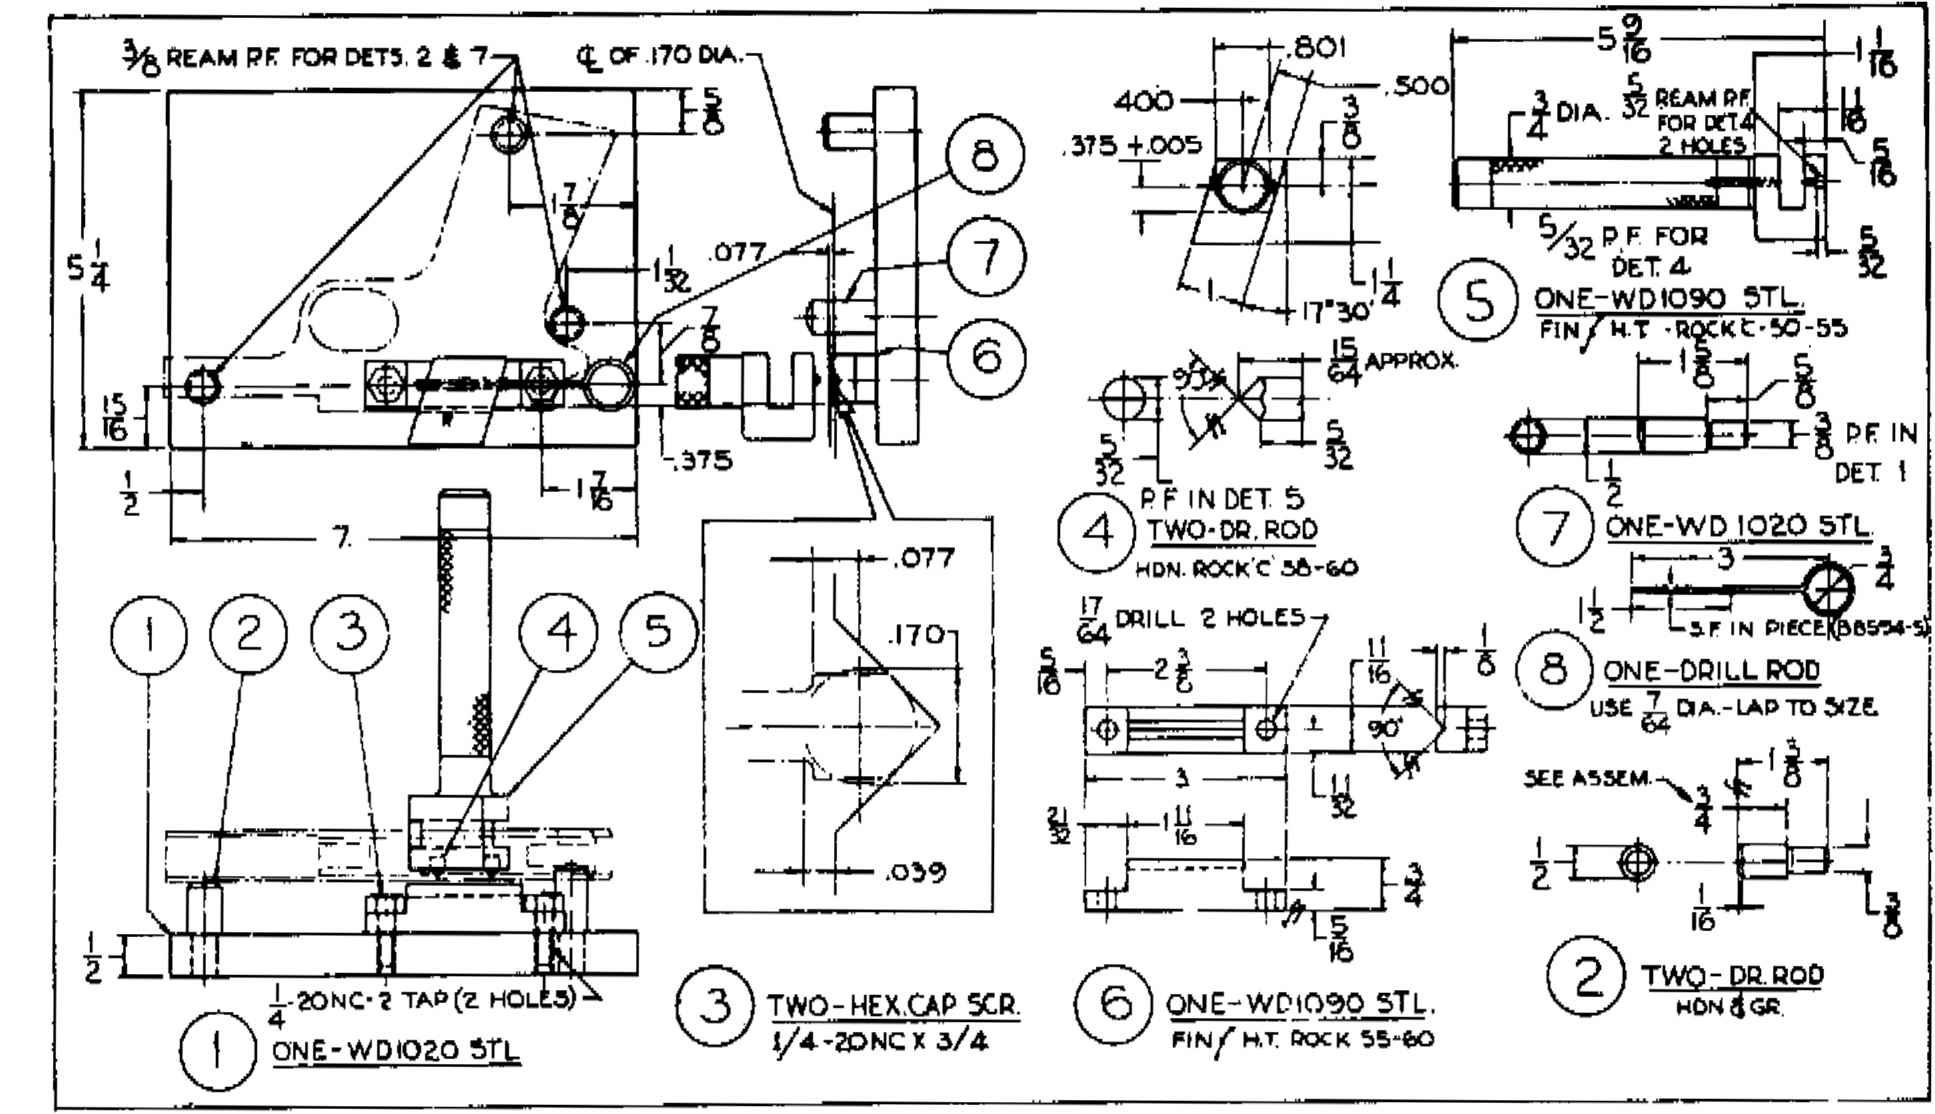 Colt 45 Detail Assembly